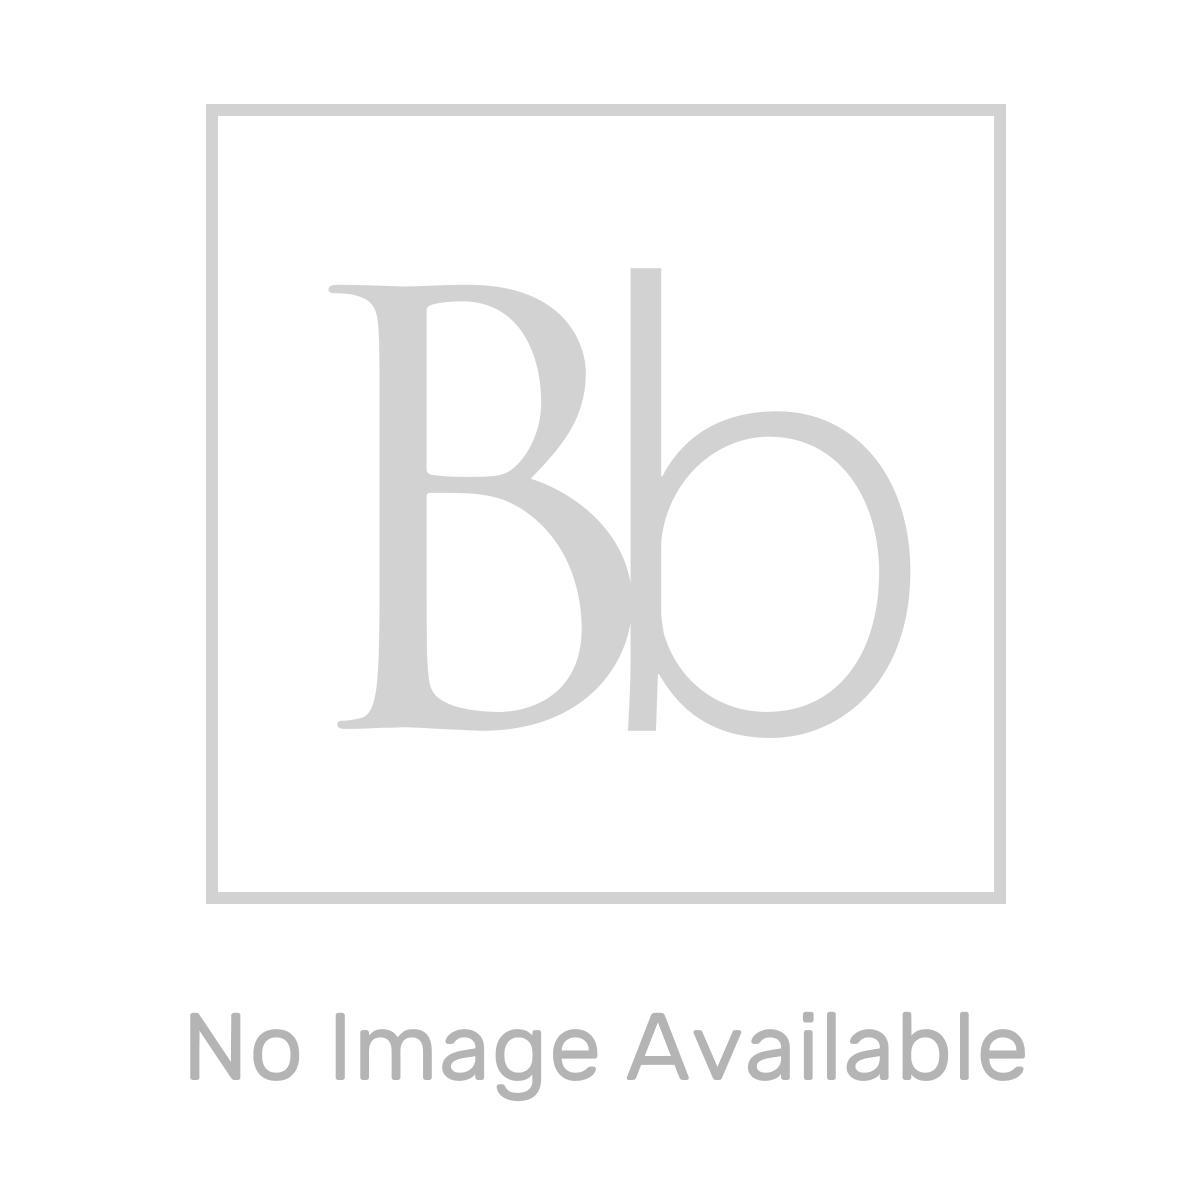 Aquadart Grey Slate Shower Tray 1700 x 700 Lifestyle